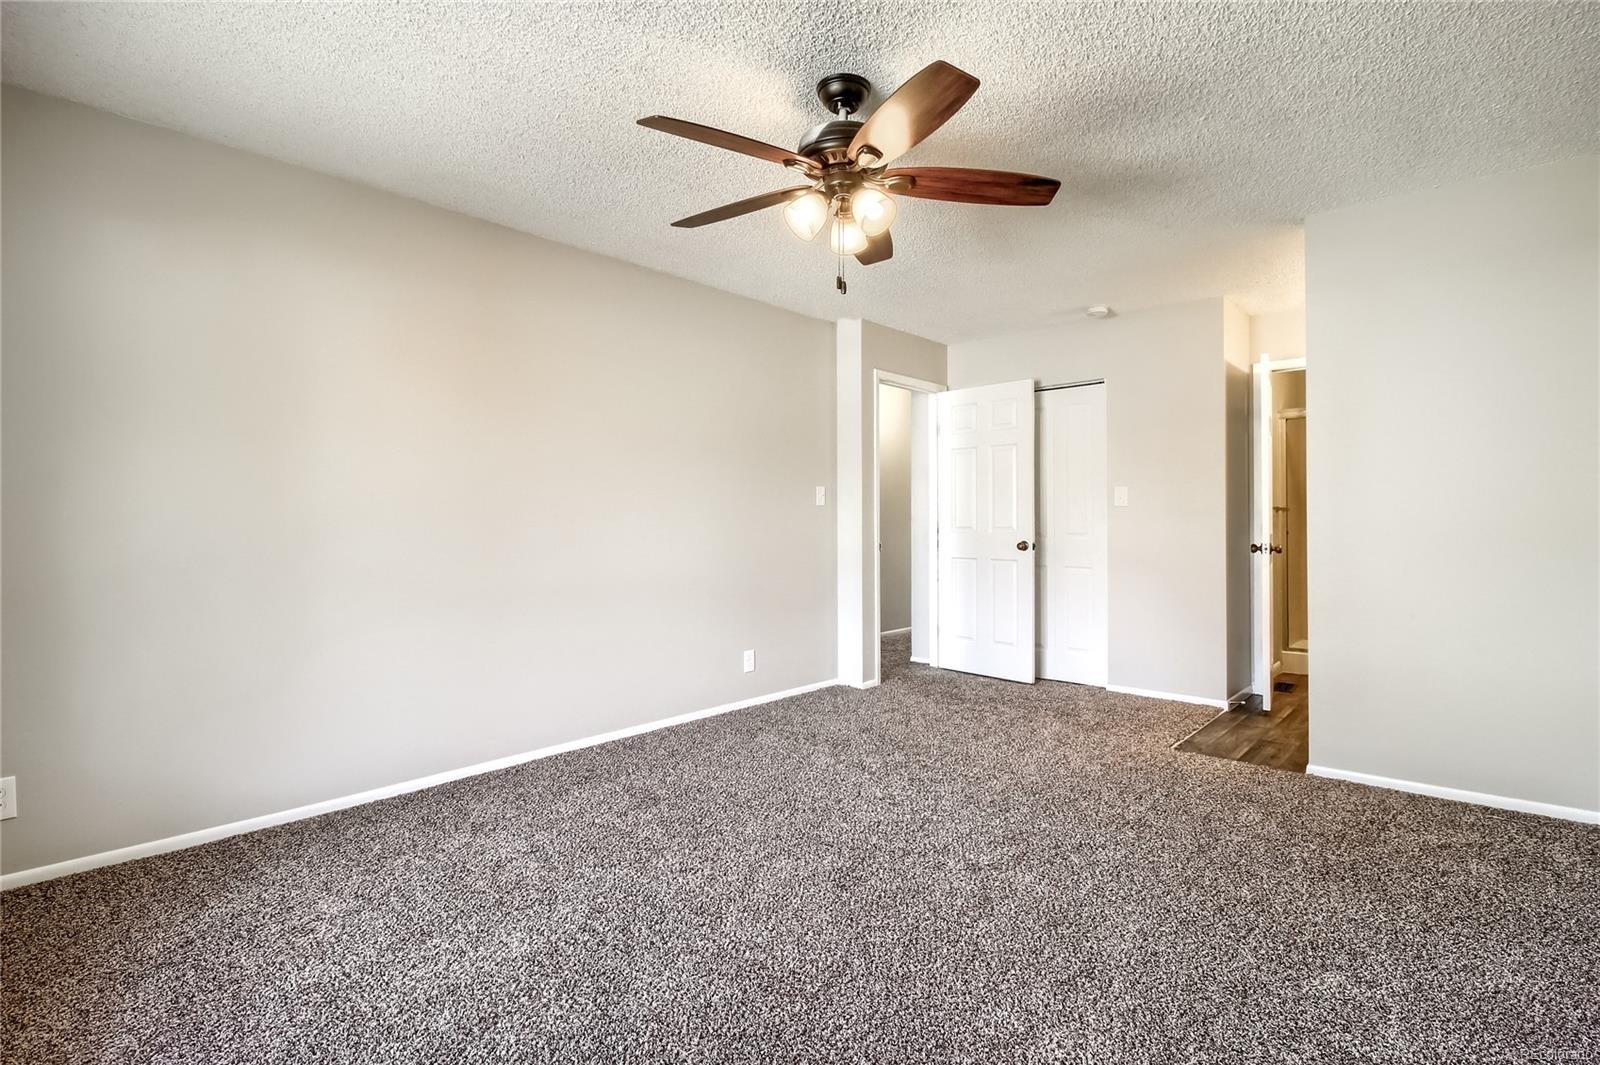 MLS# 4817896 - 20 - 5080 Worchester Street, Denver, CO 80239